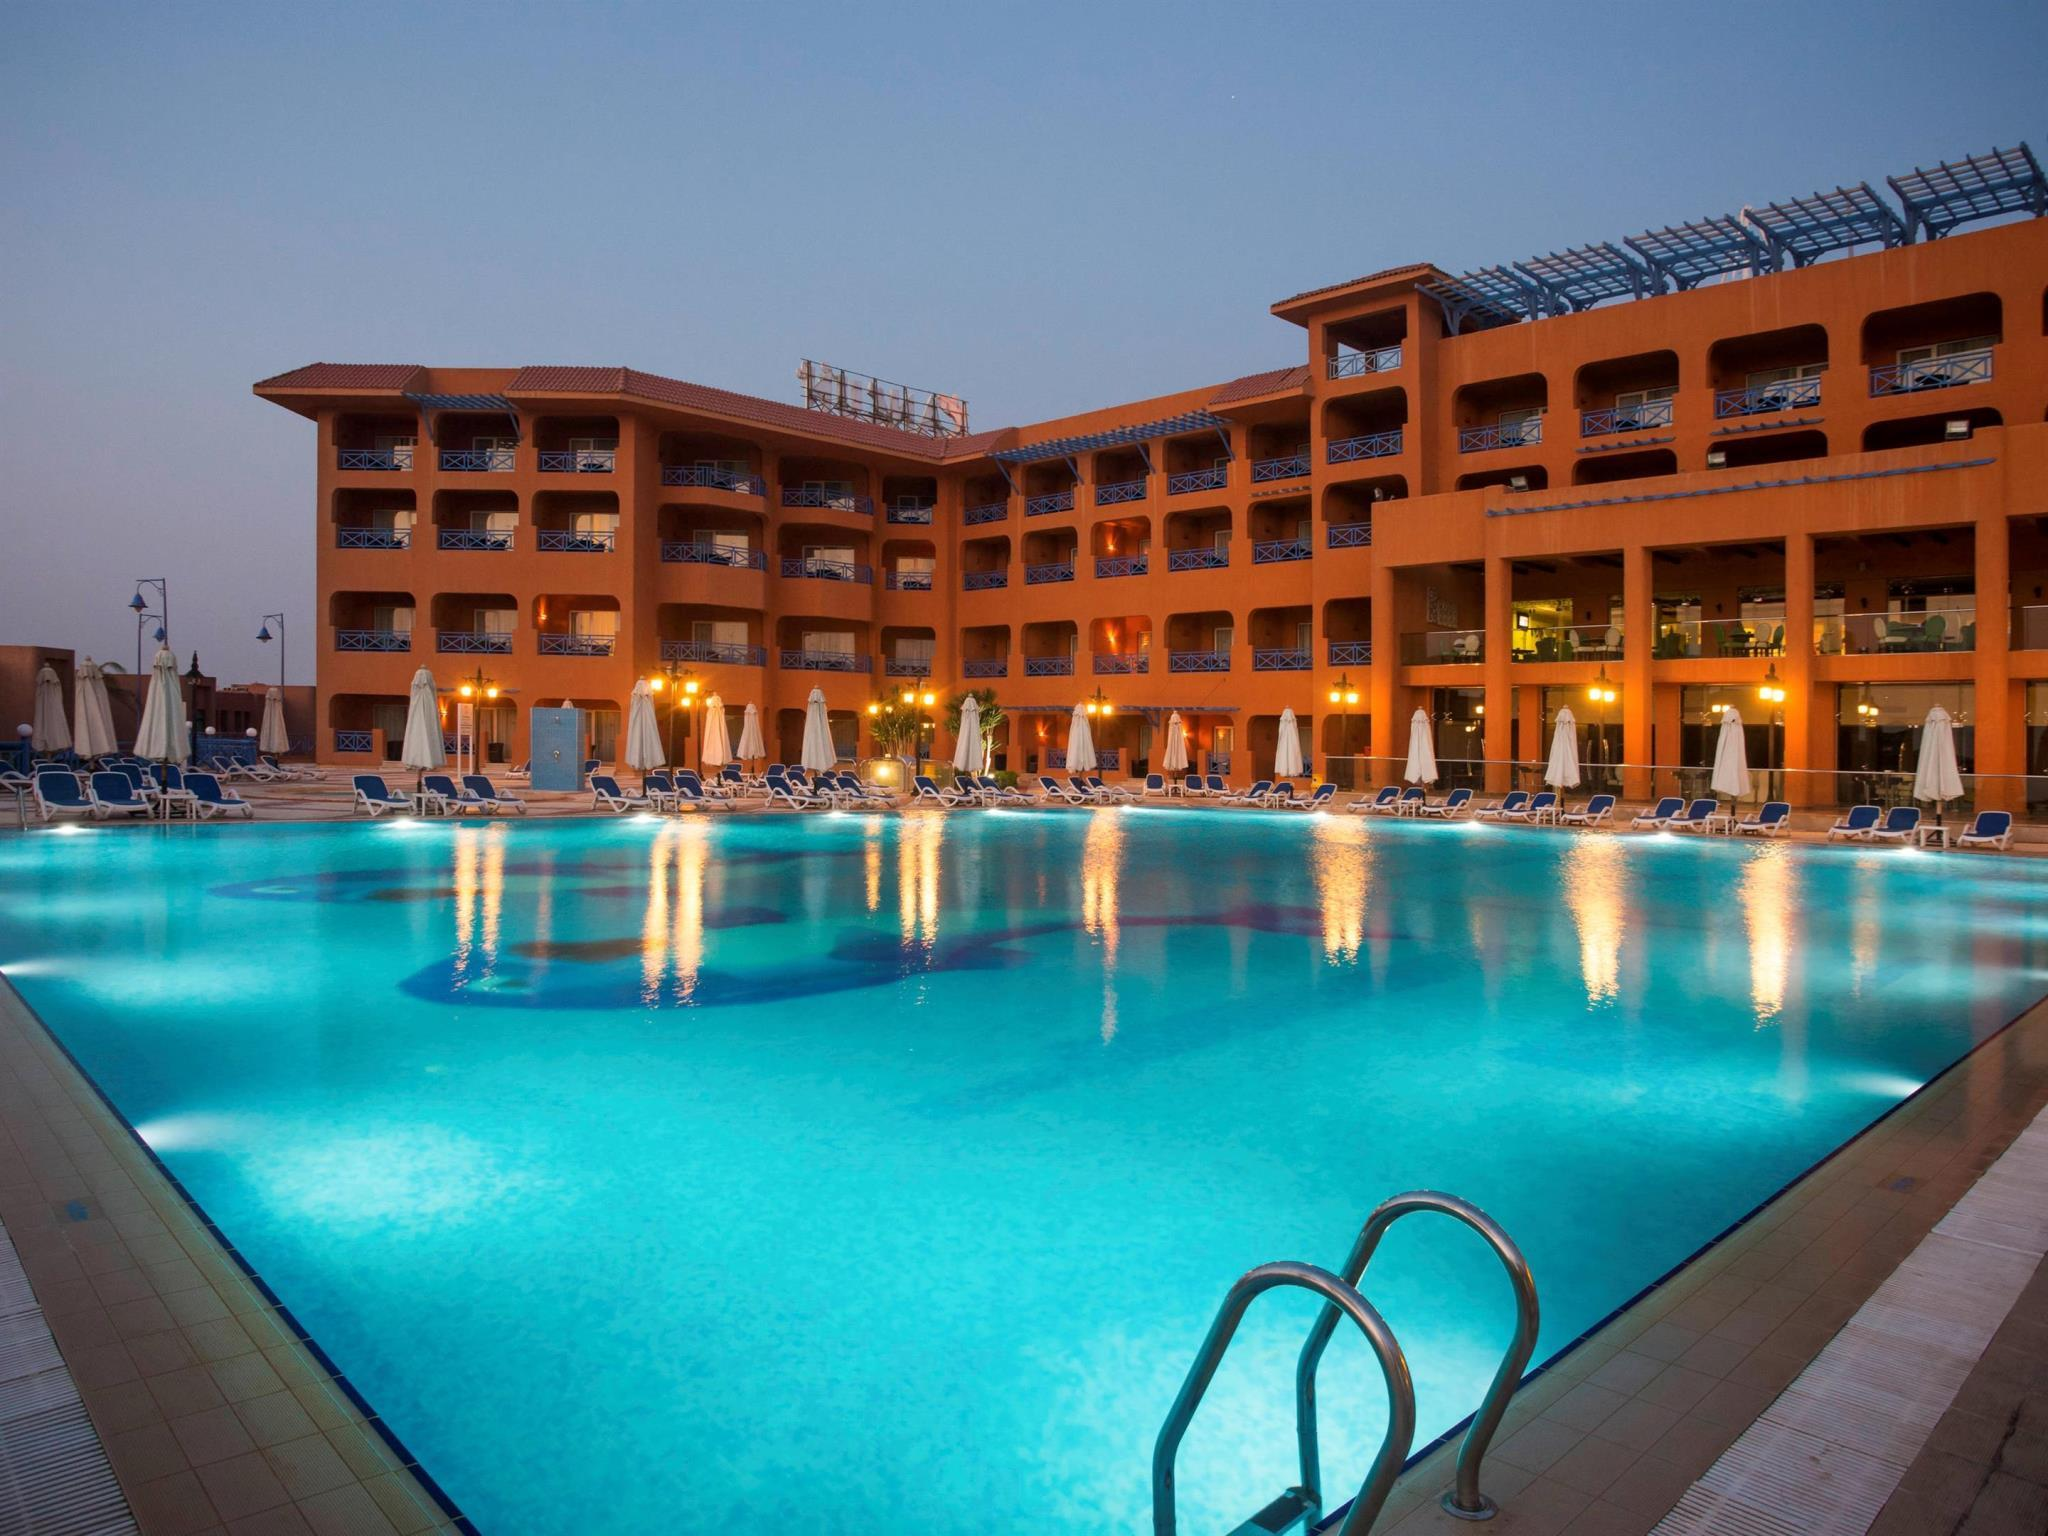 Cancun Sokhna Managed By Accorhotels, 'Ataqah